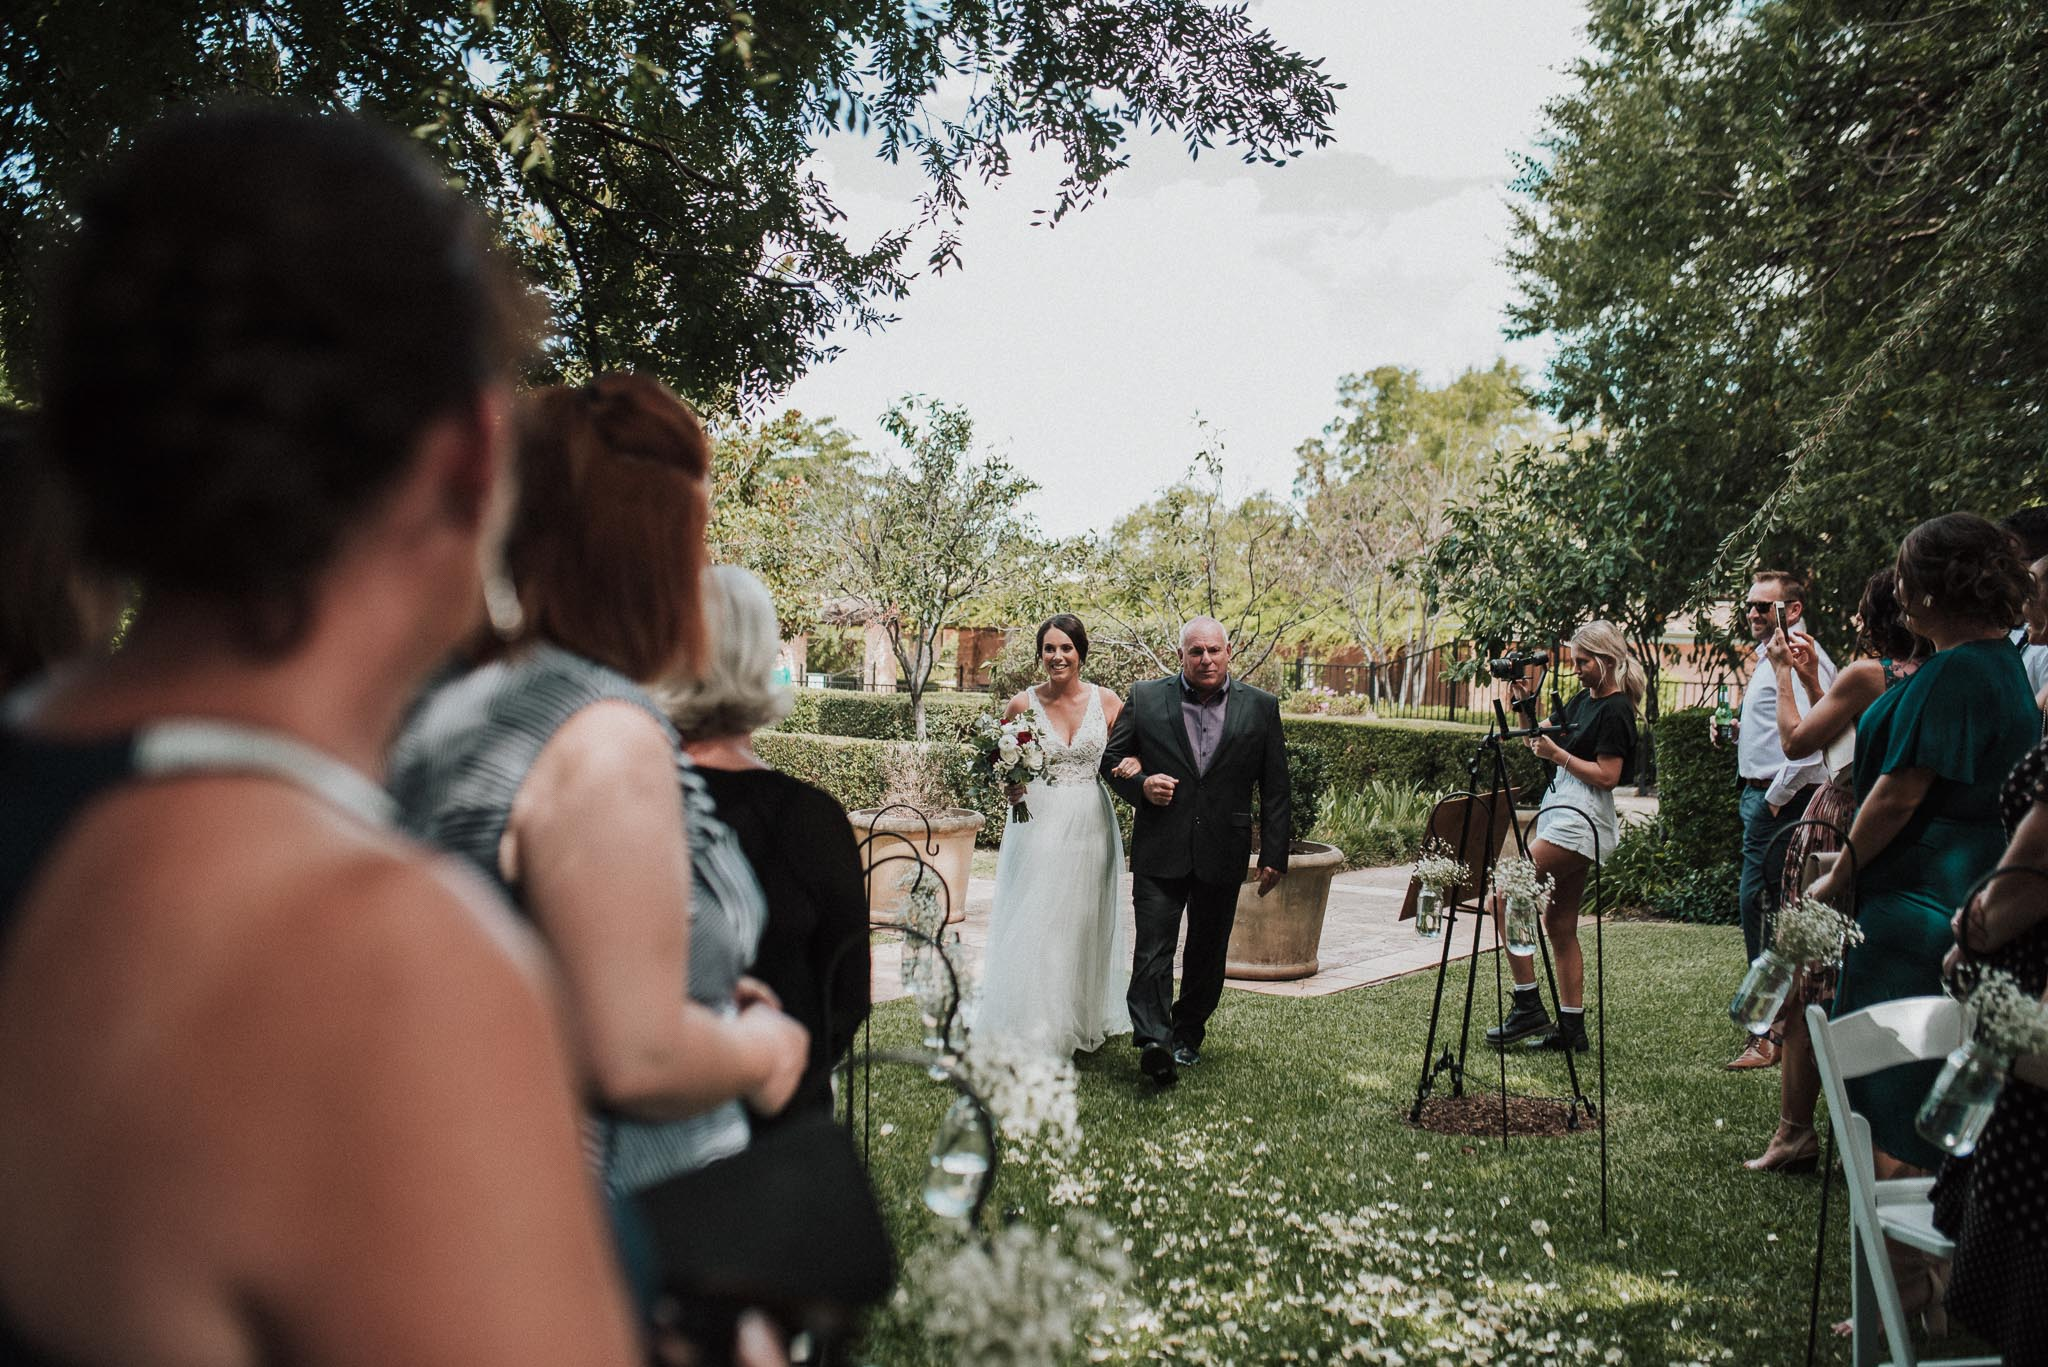 MECURE-RESORT-WEDDING-KING-WEB-32.jpg